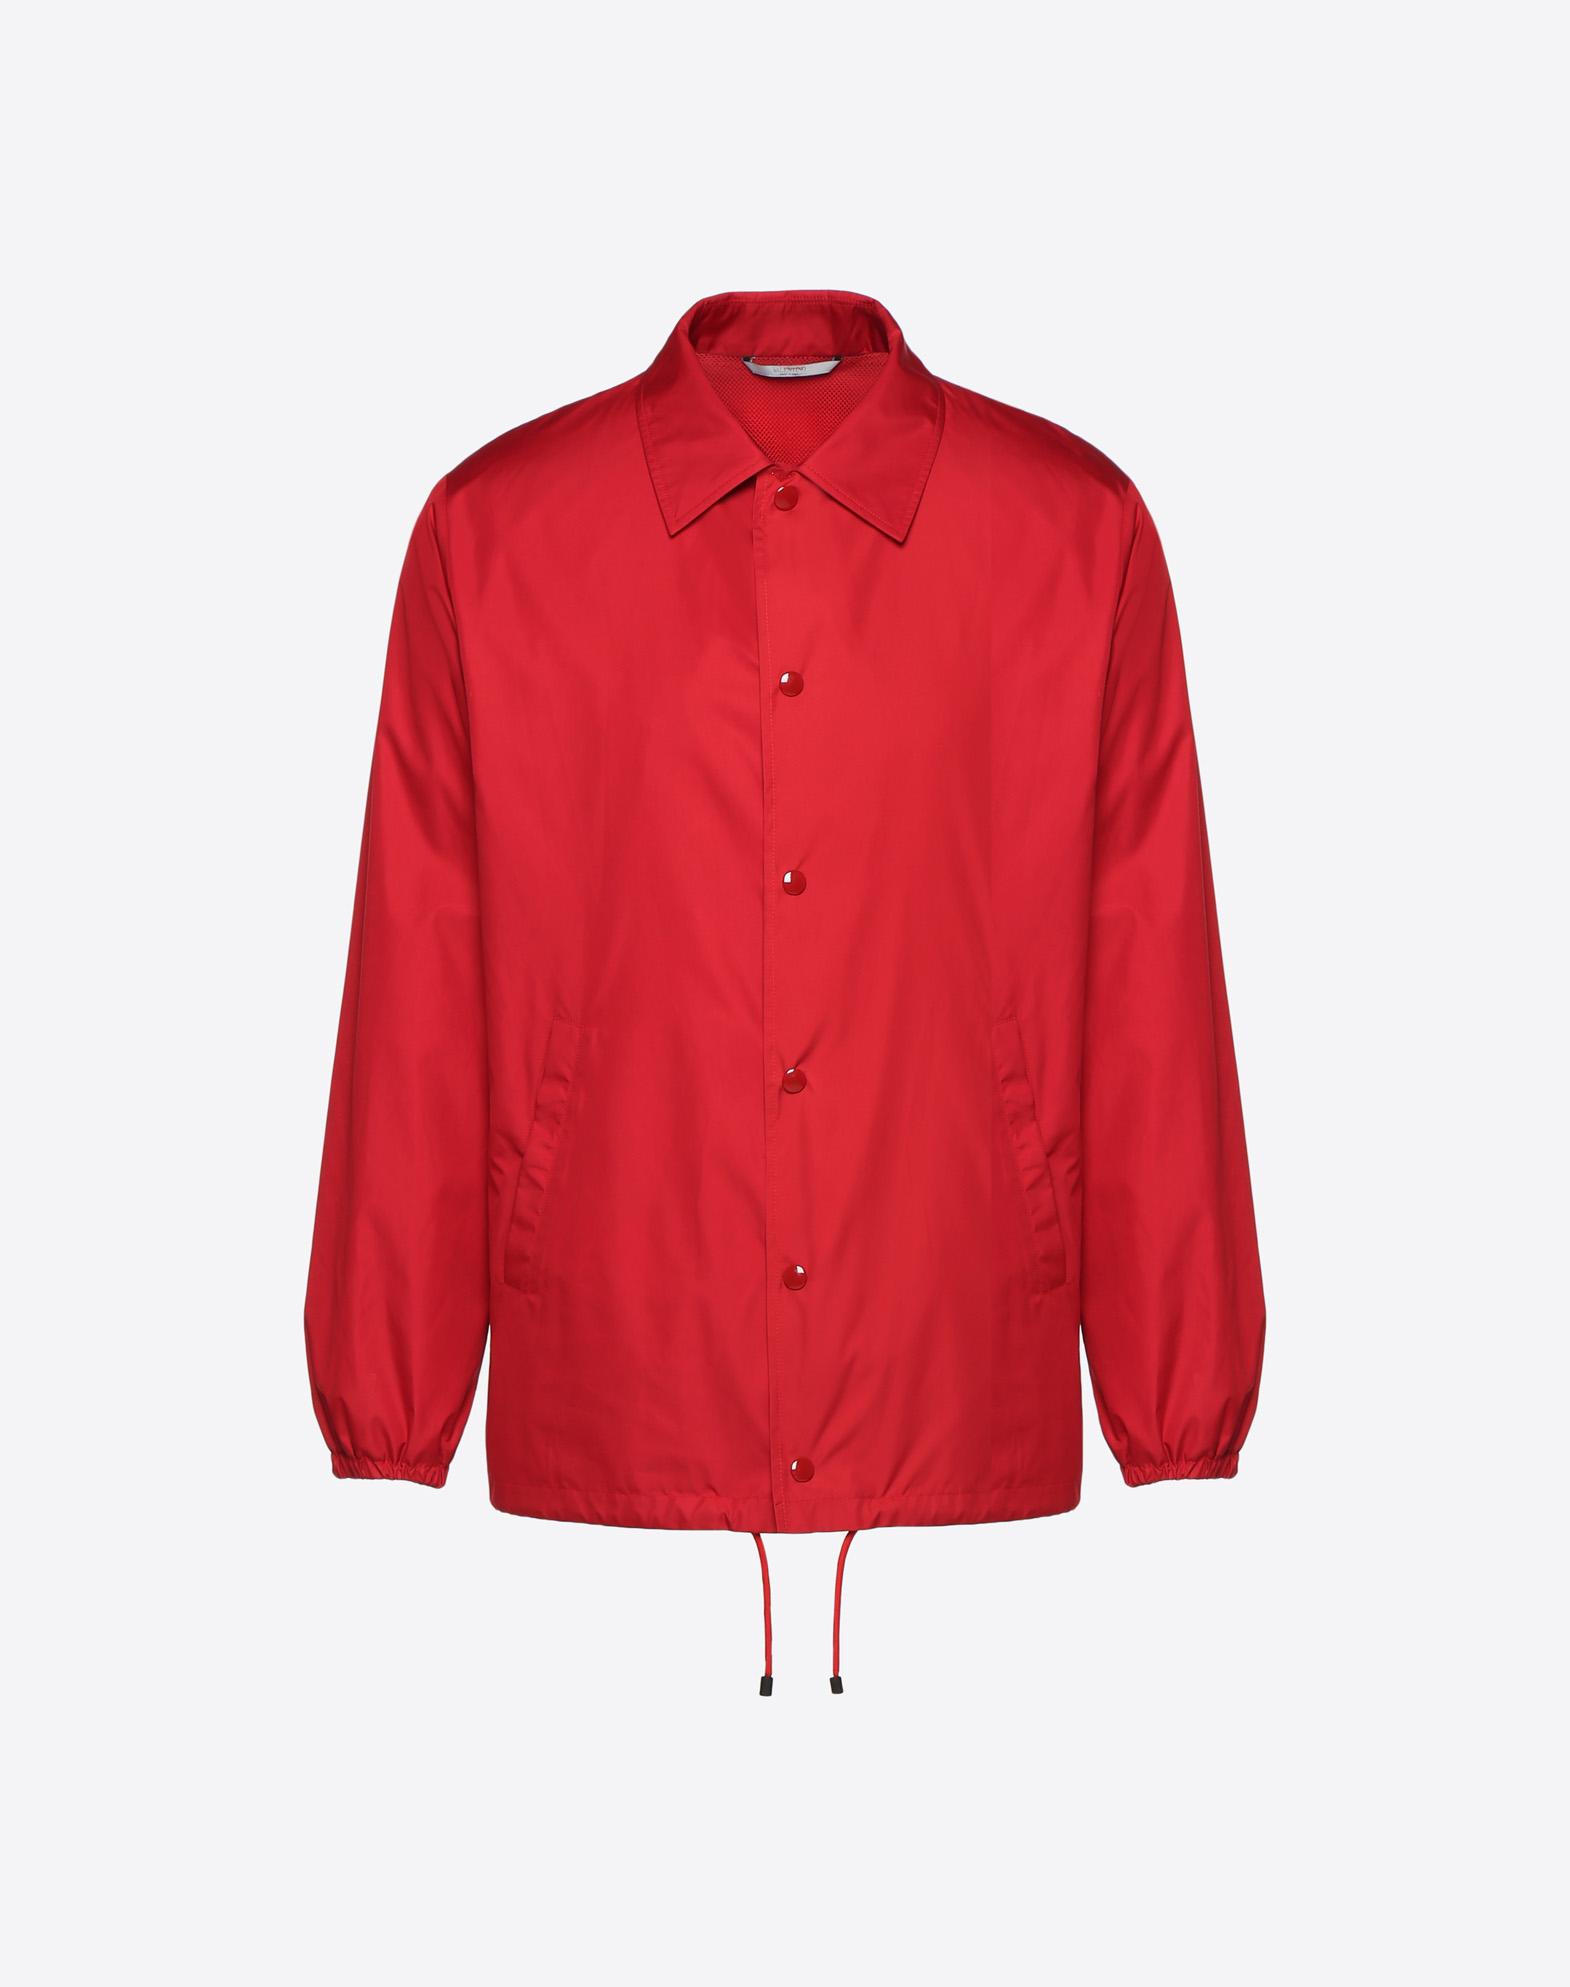 Coach jacket with VLTN print